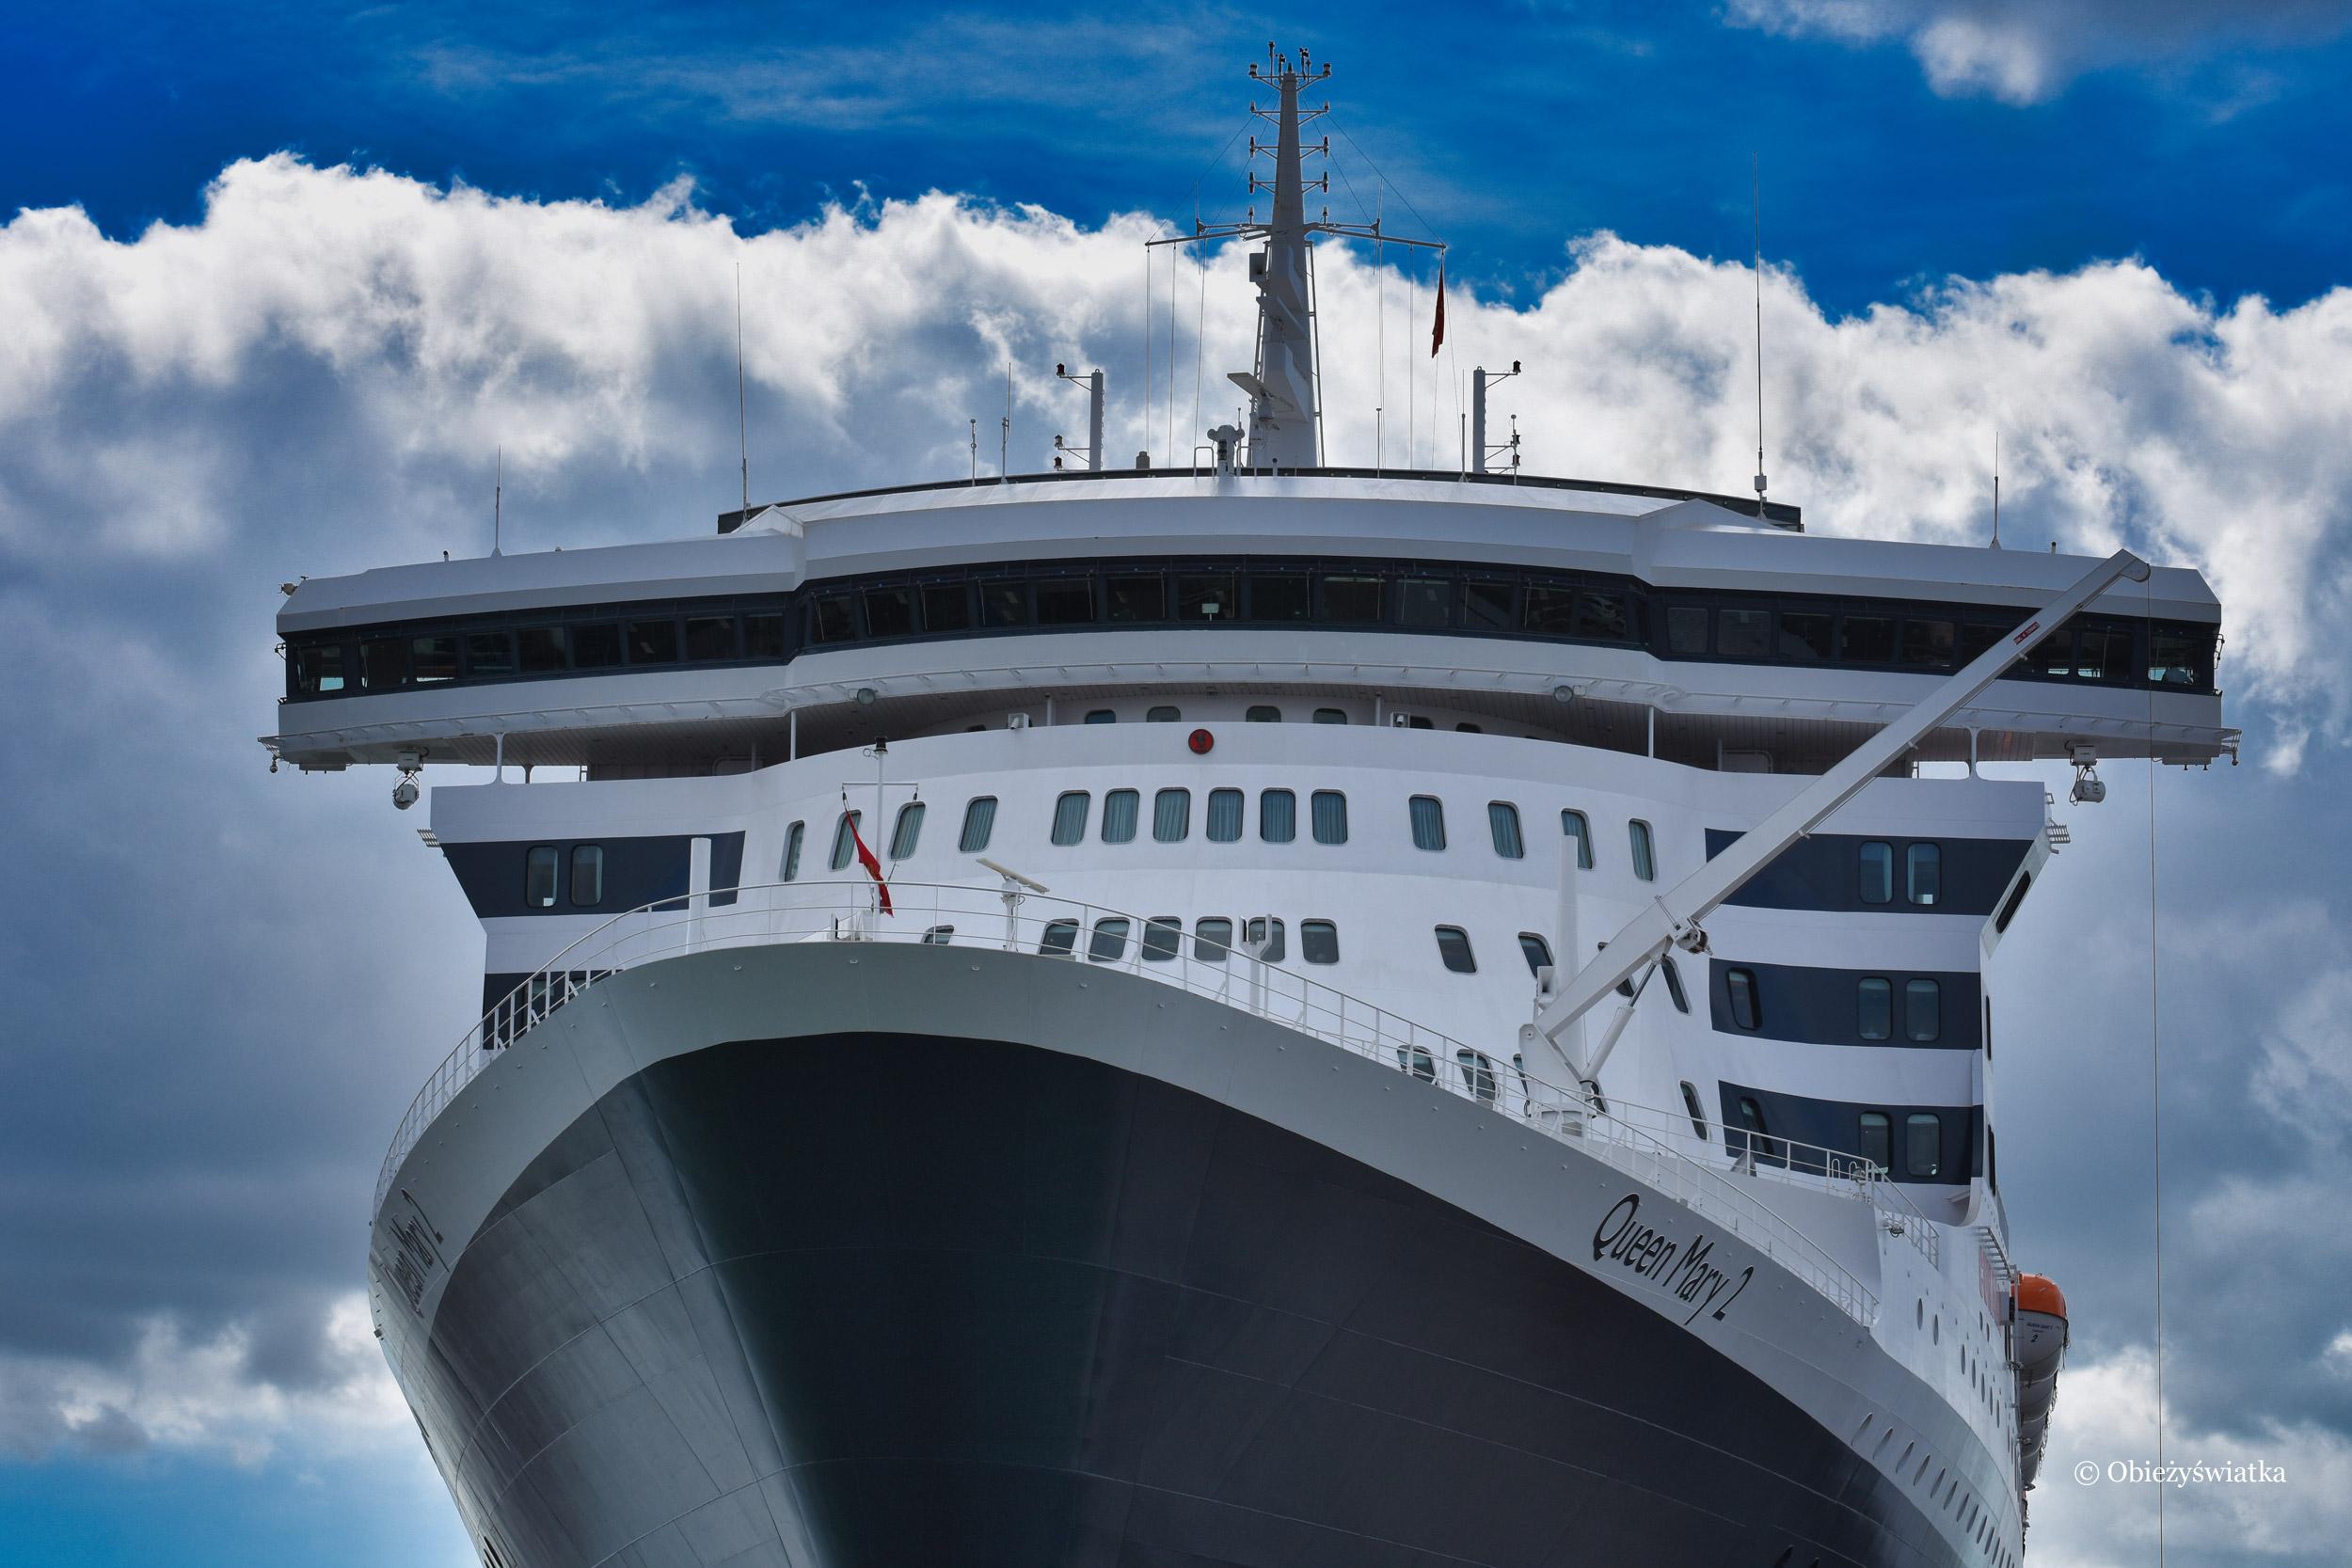 Liniowiec transatlantycki Queen Mary 2